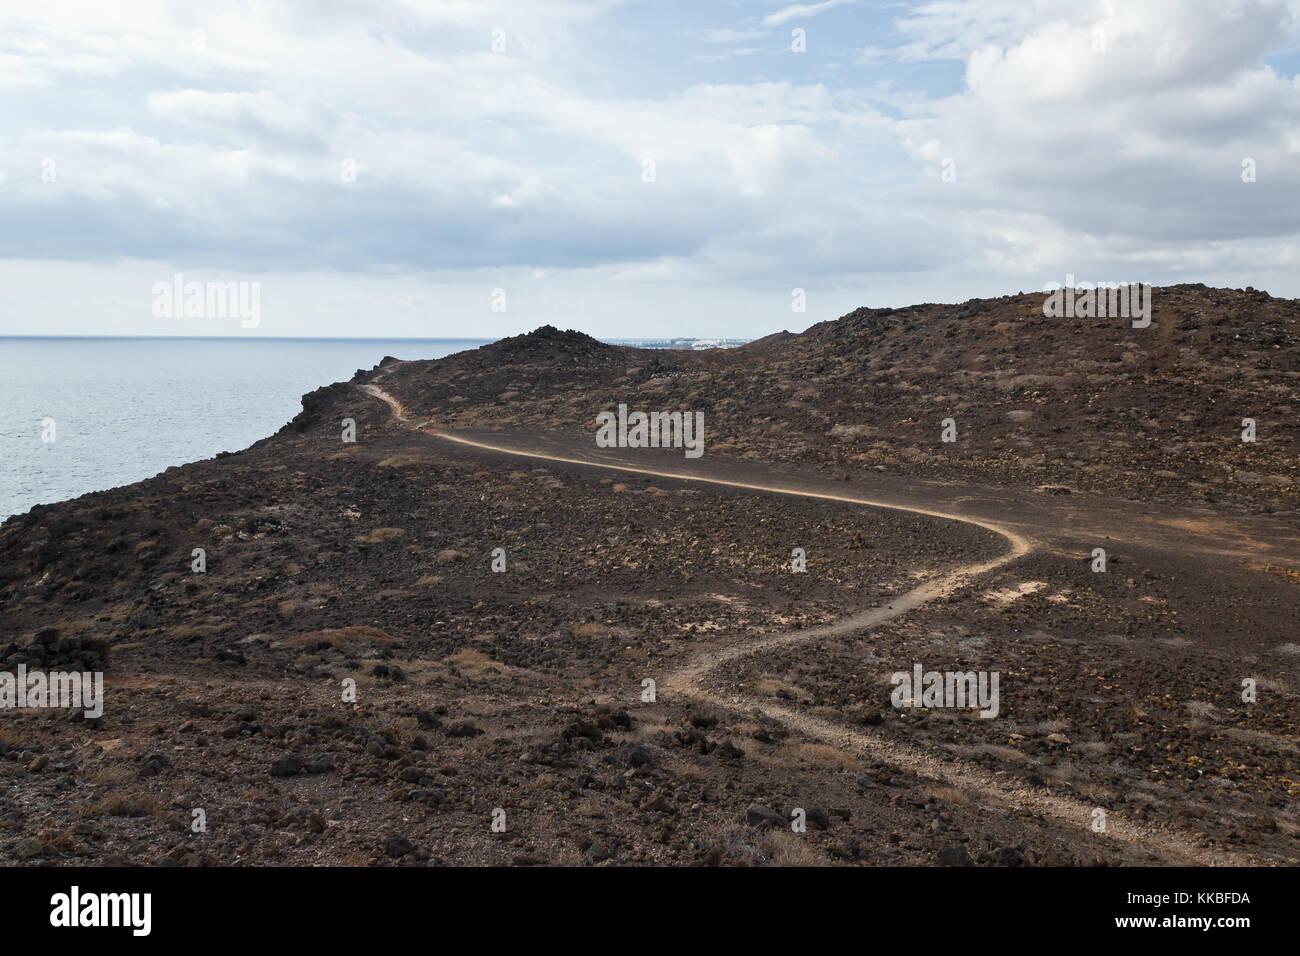 Trail in lava fields, Lanzarote, Spain - Stock Image